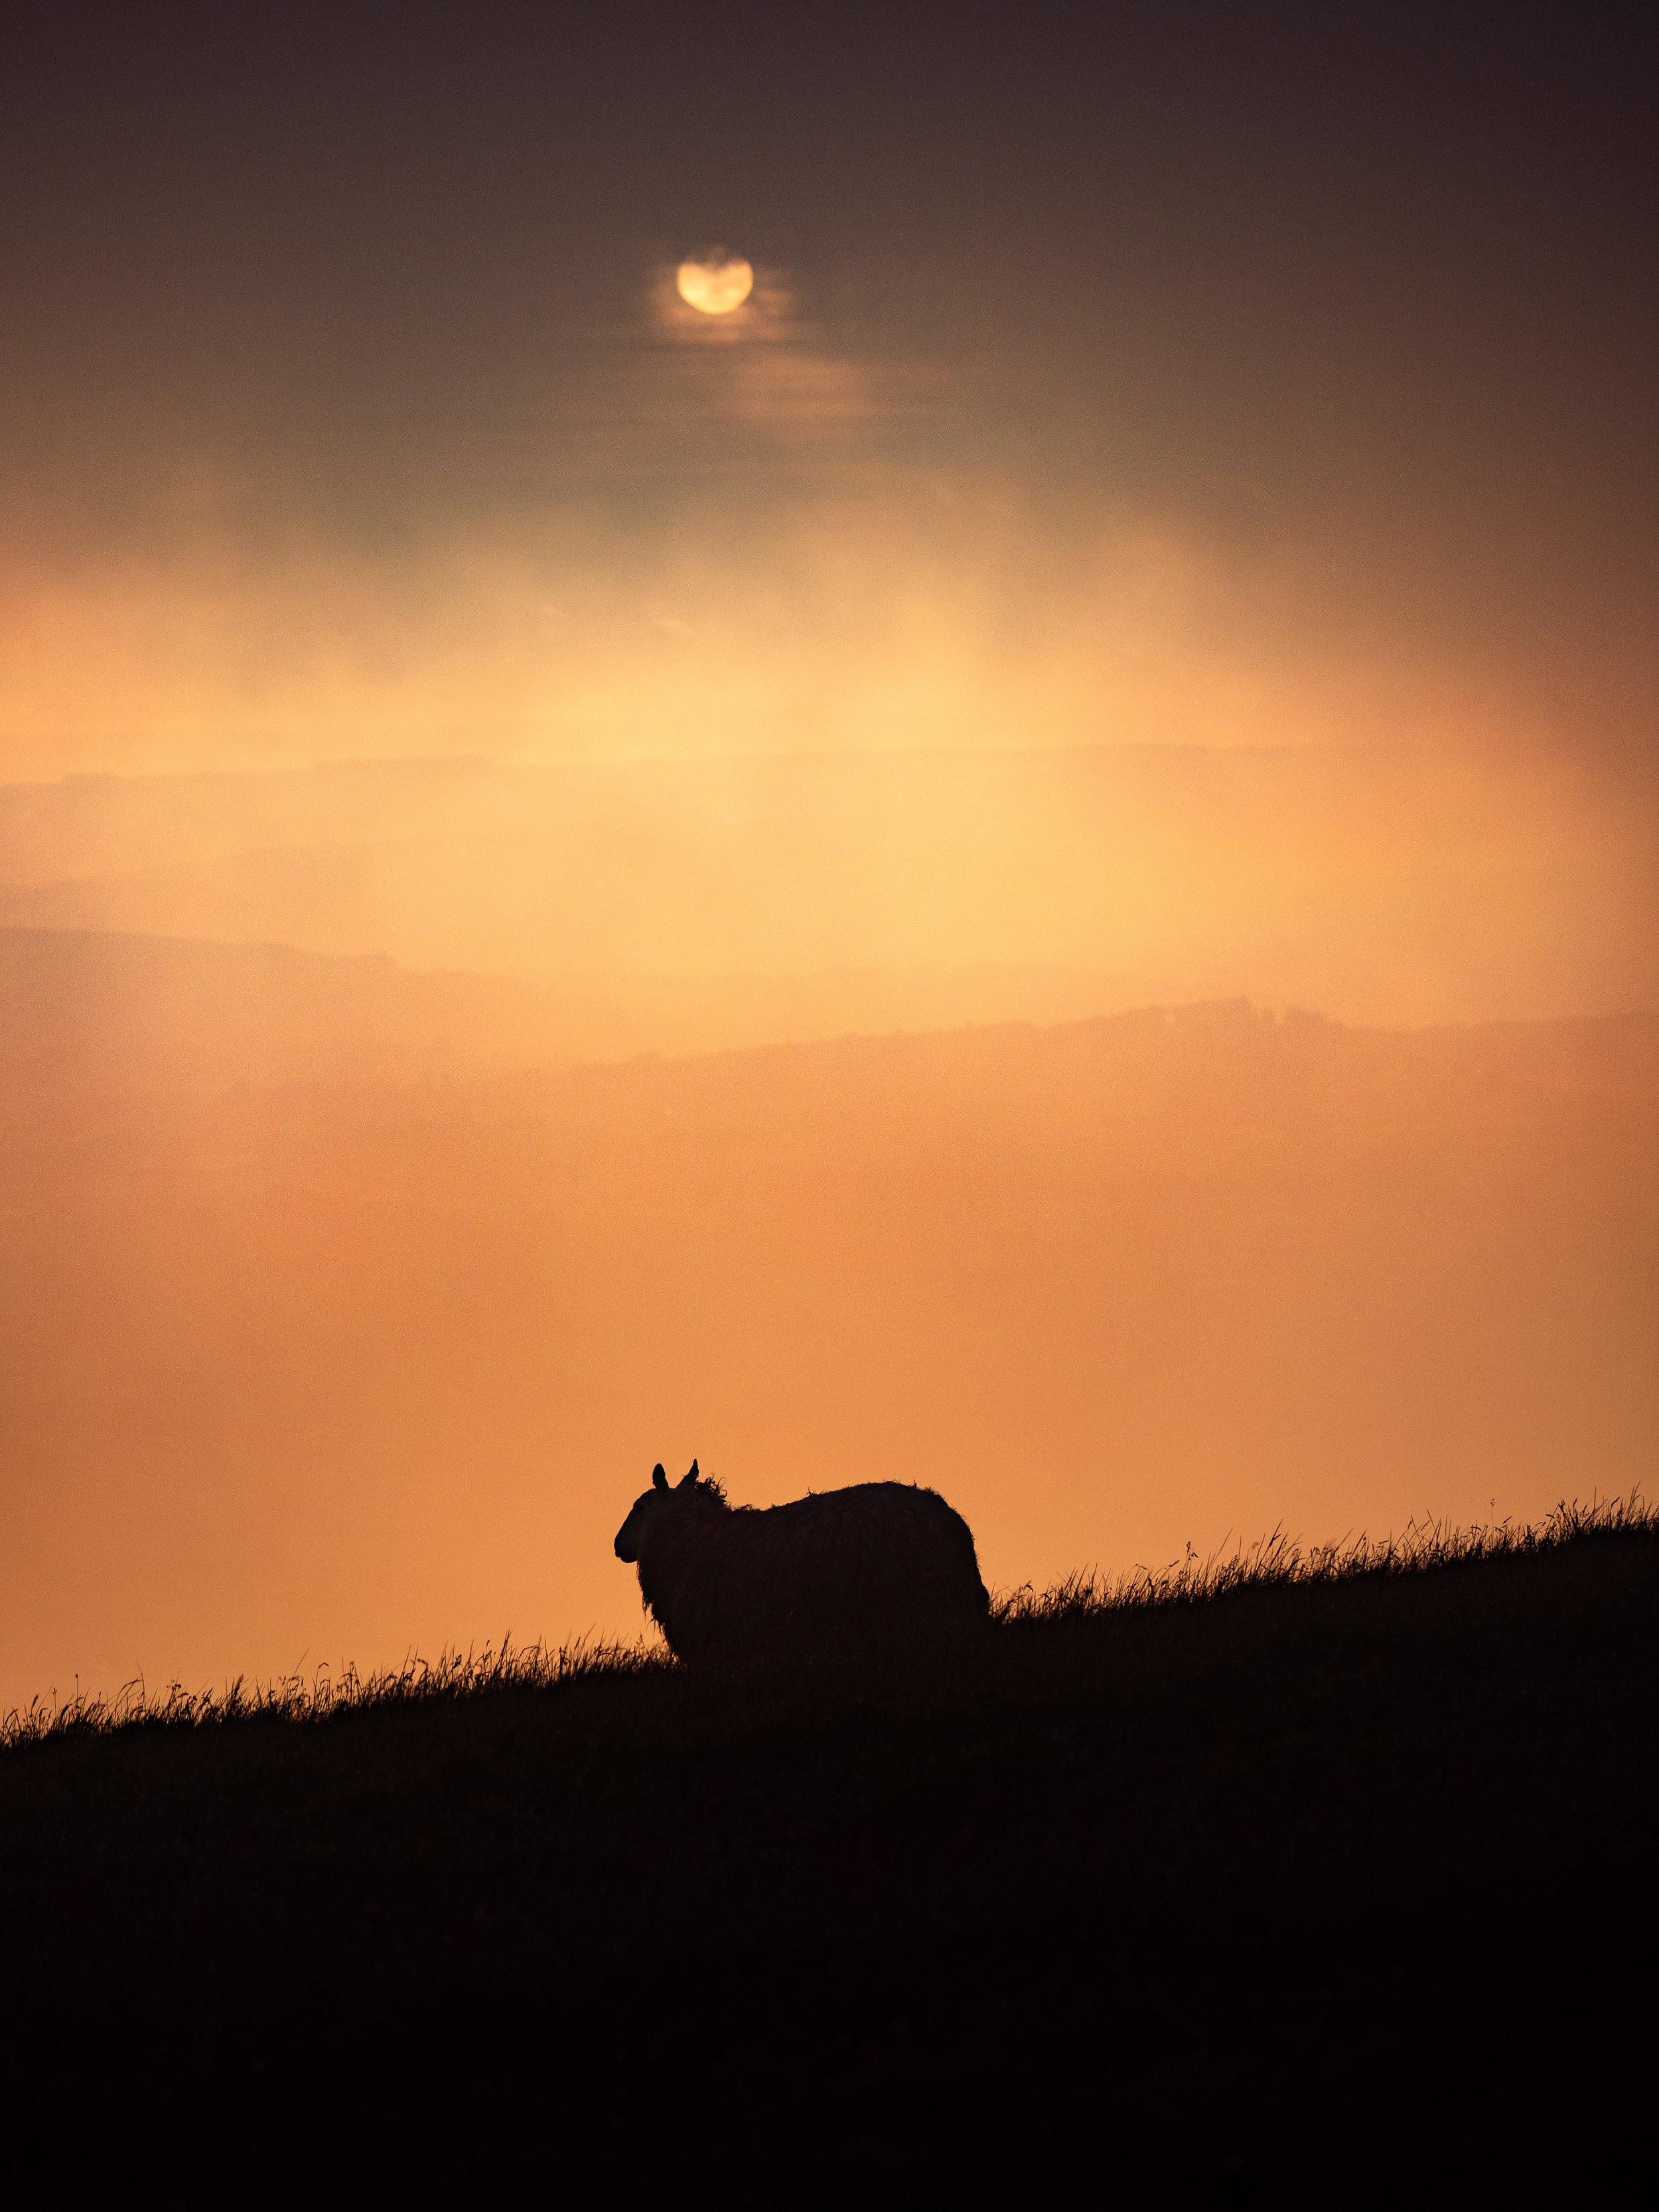 Sheepish Silhouette